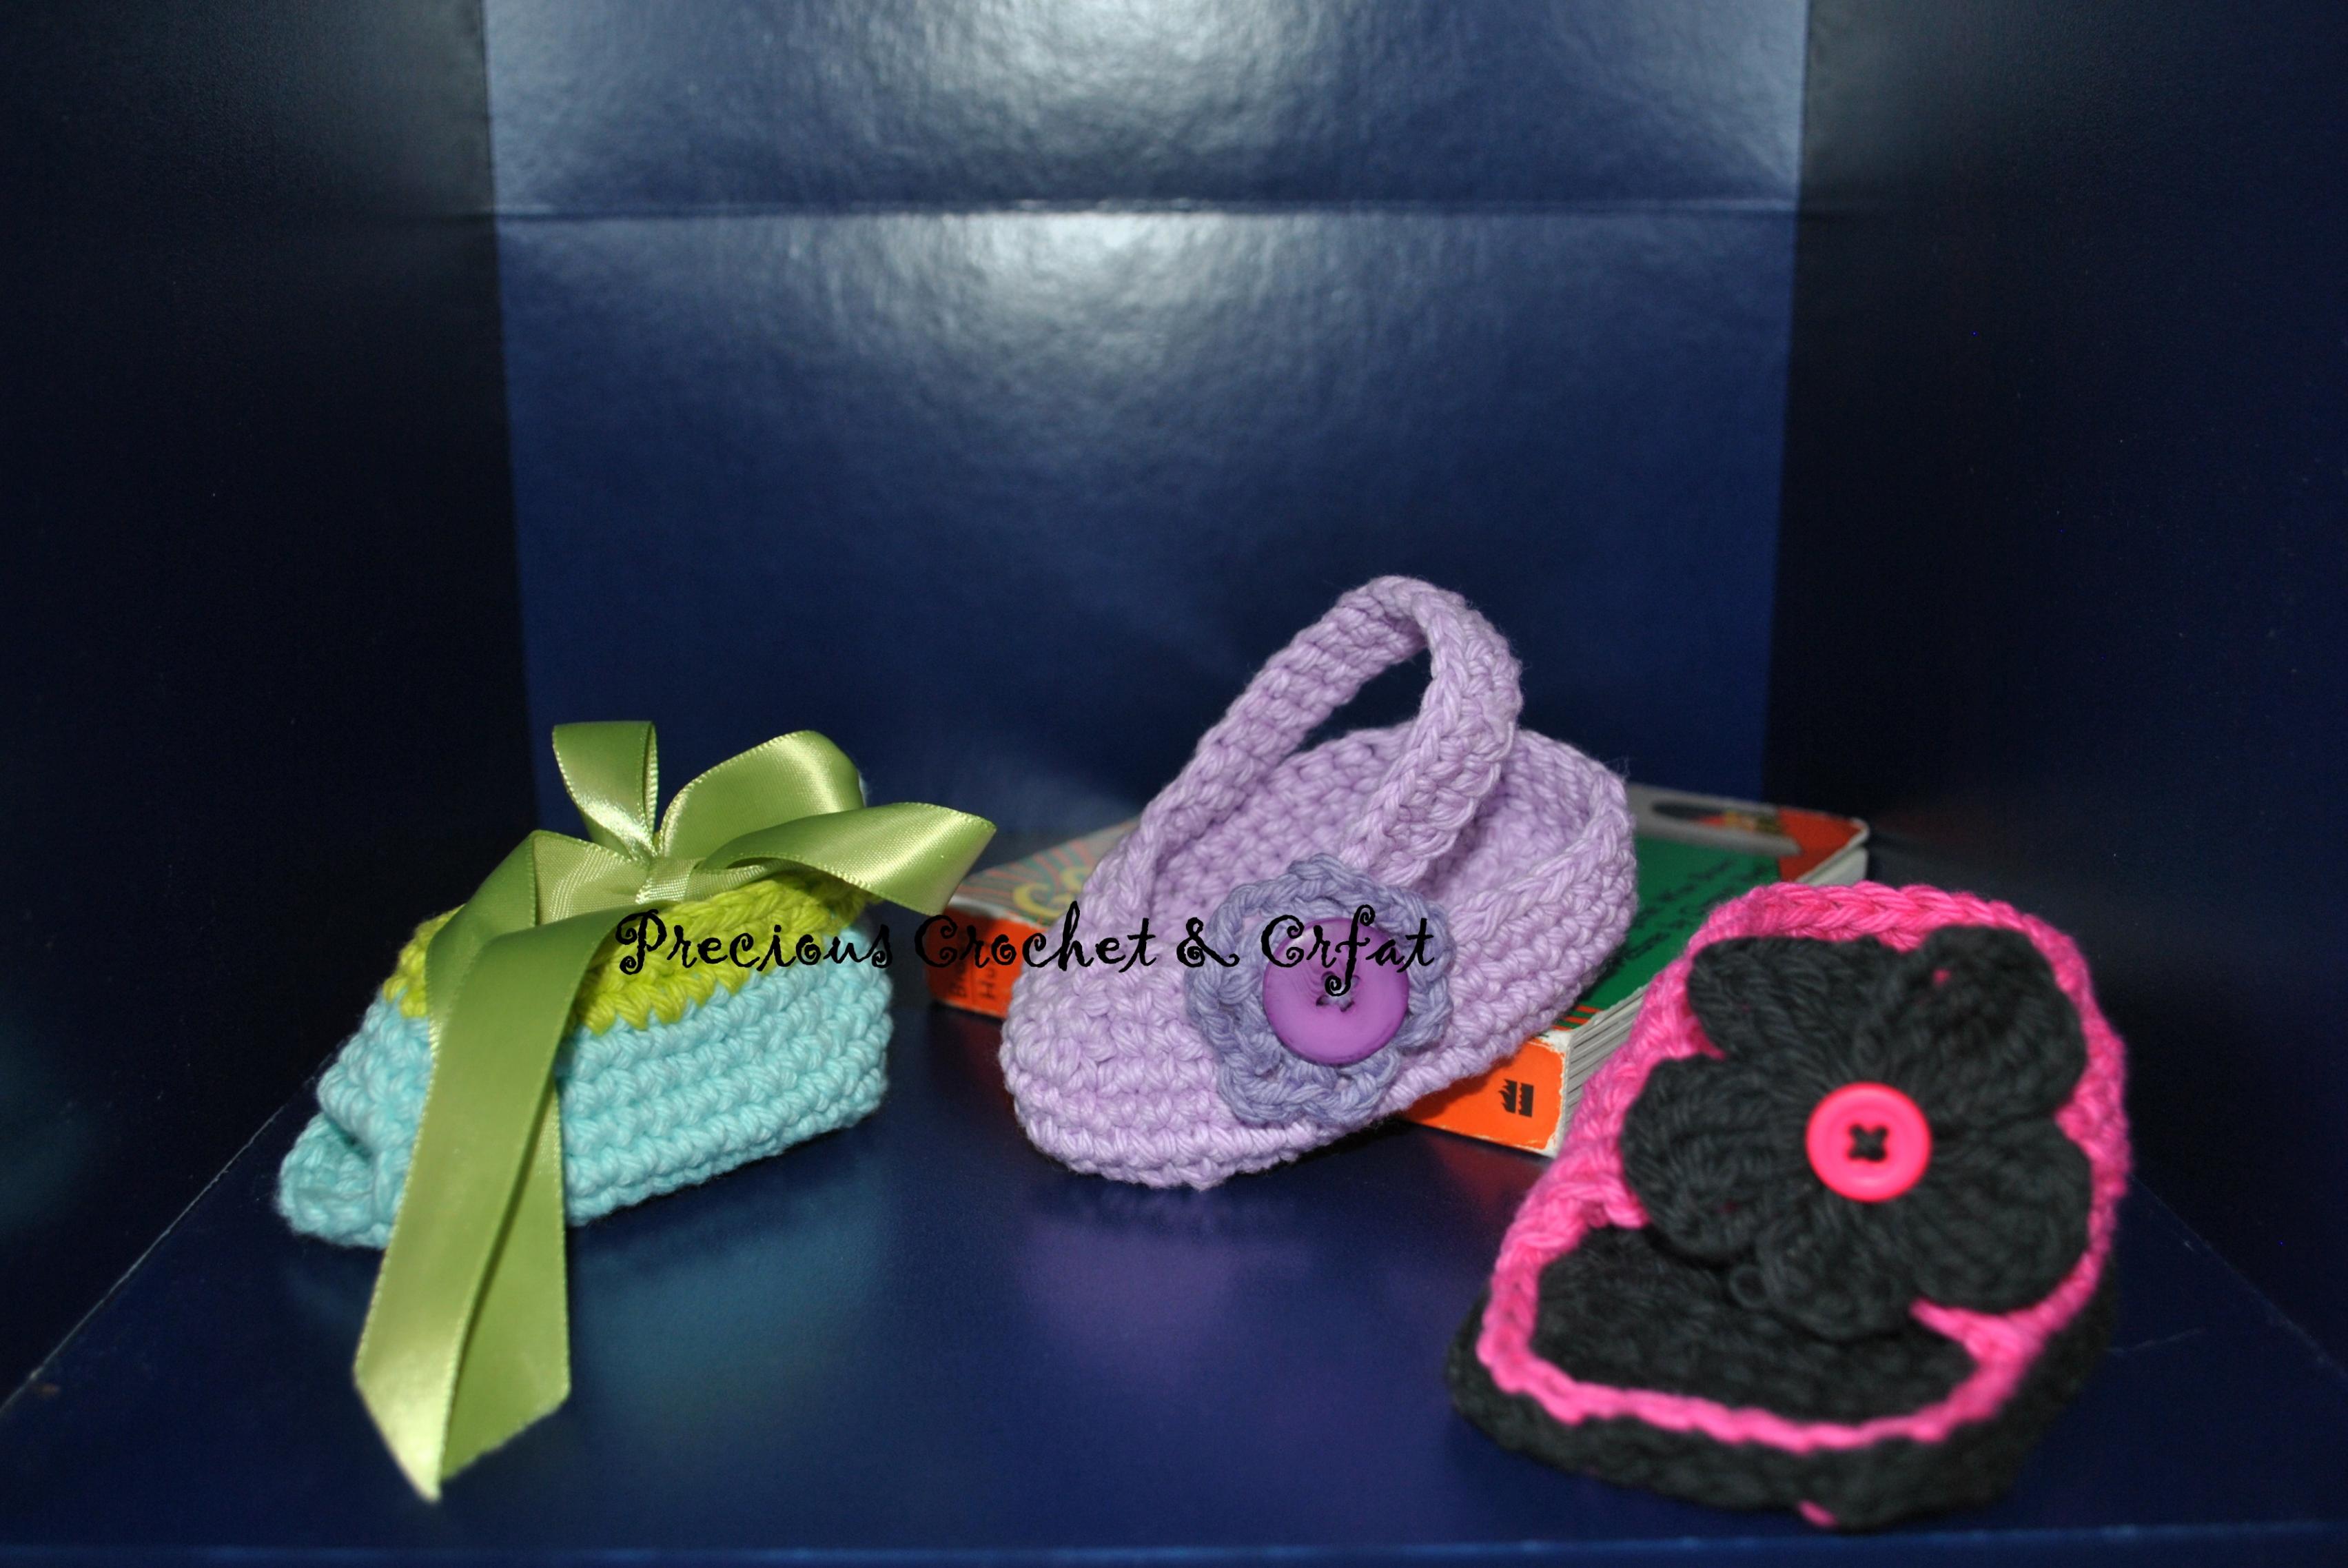 Your babies Shoes Rack · My Precious Crochet · line